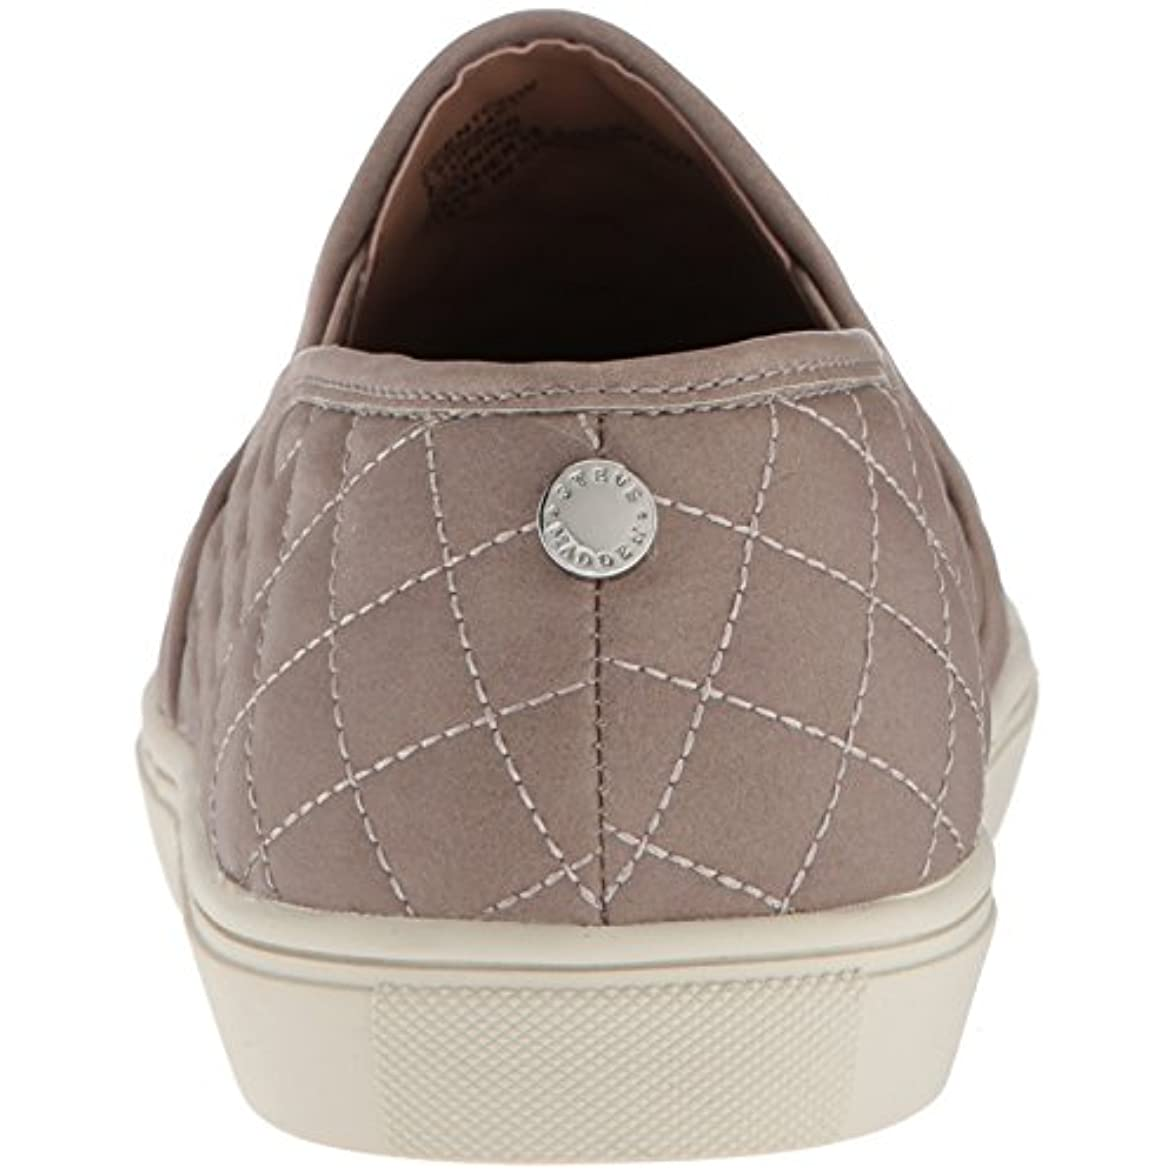 Steve Madden Women's Ecentrcq Sneaker Grey 6 5 Wide